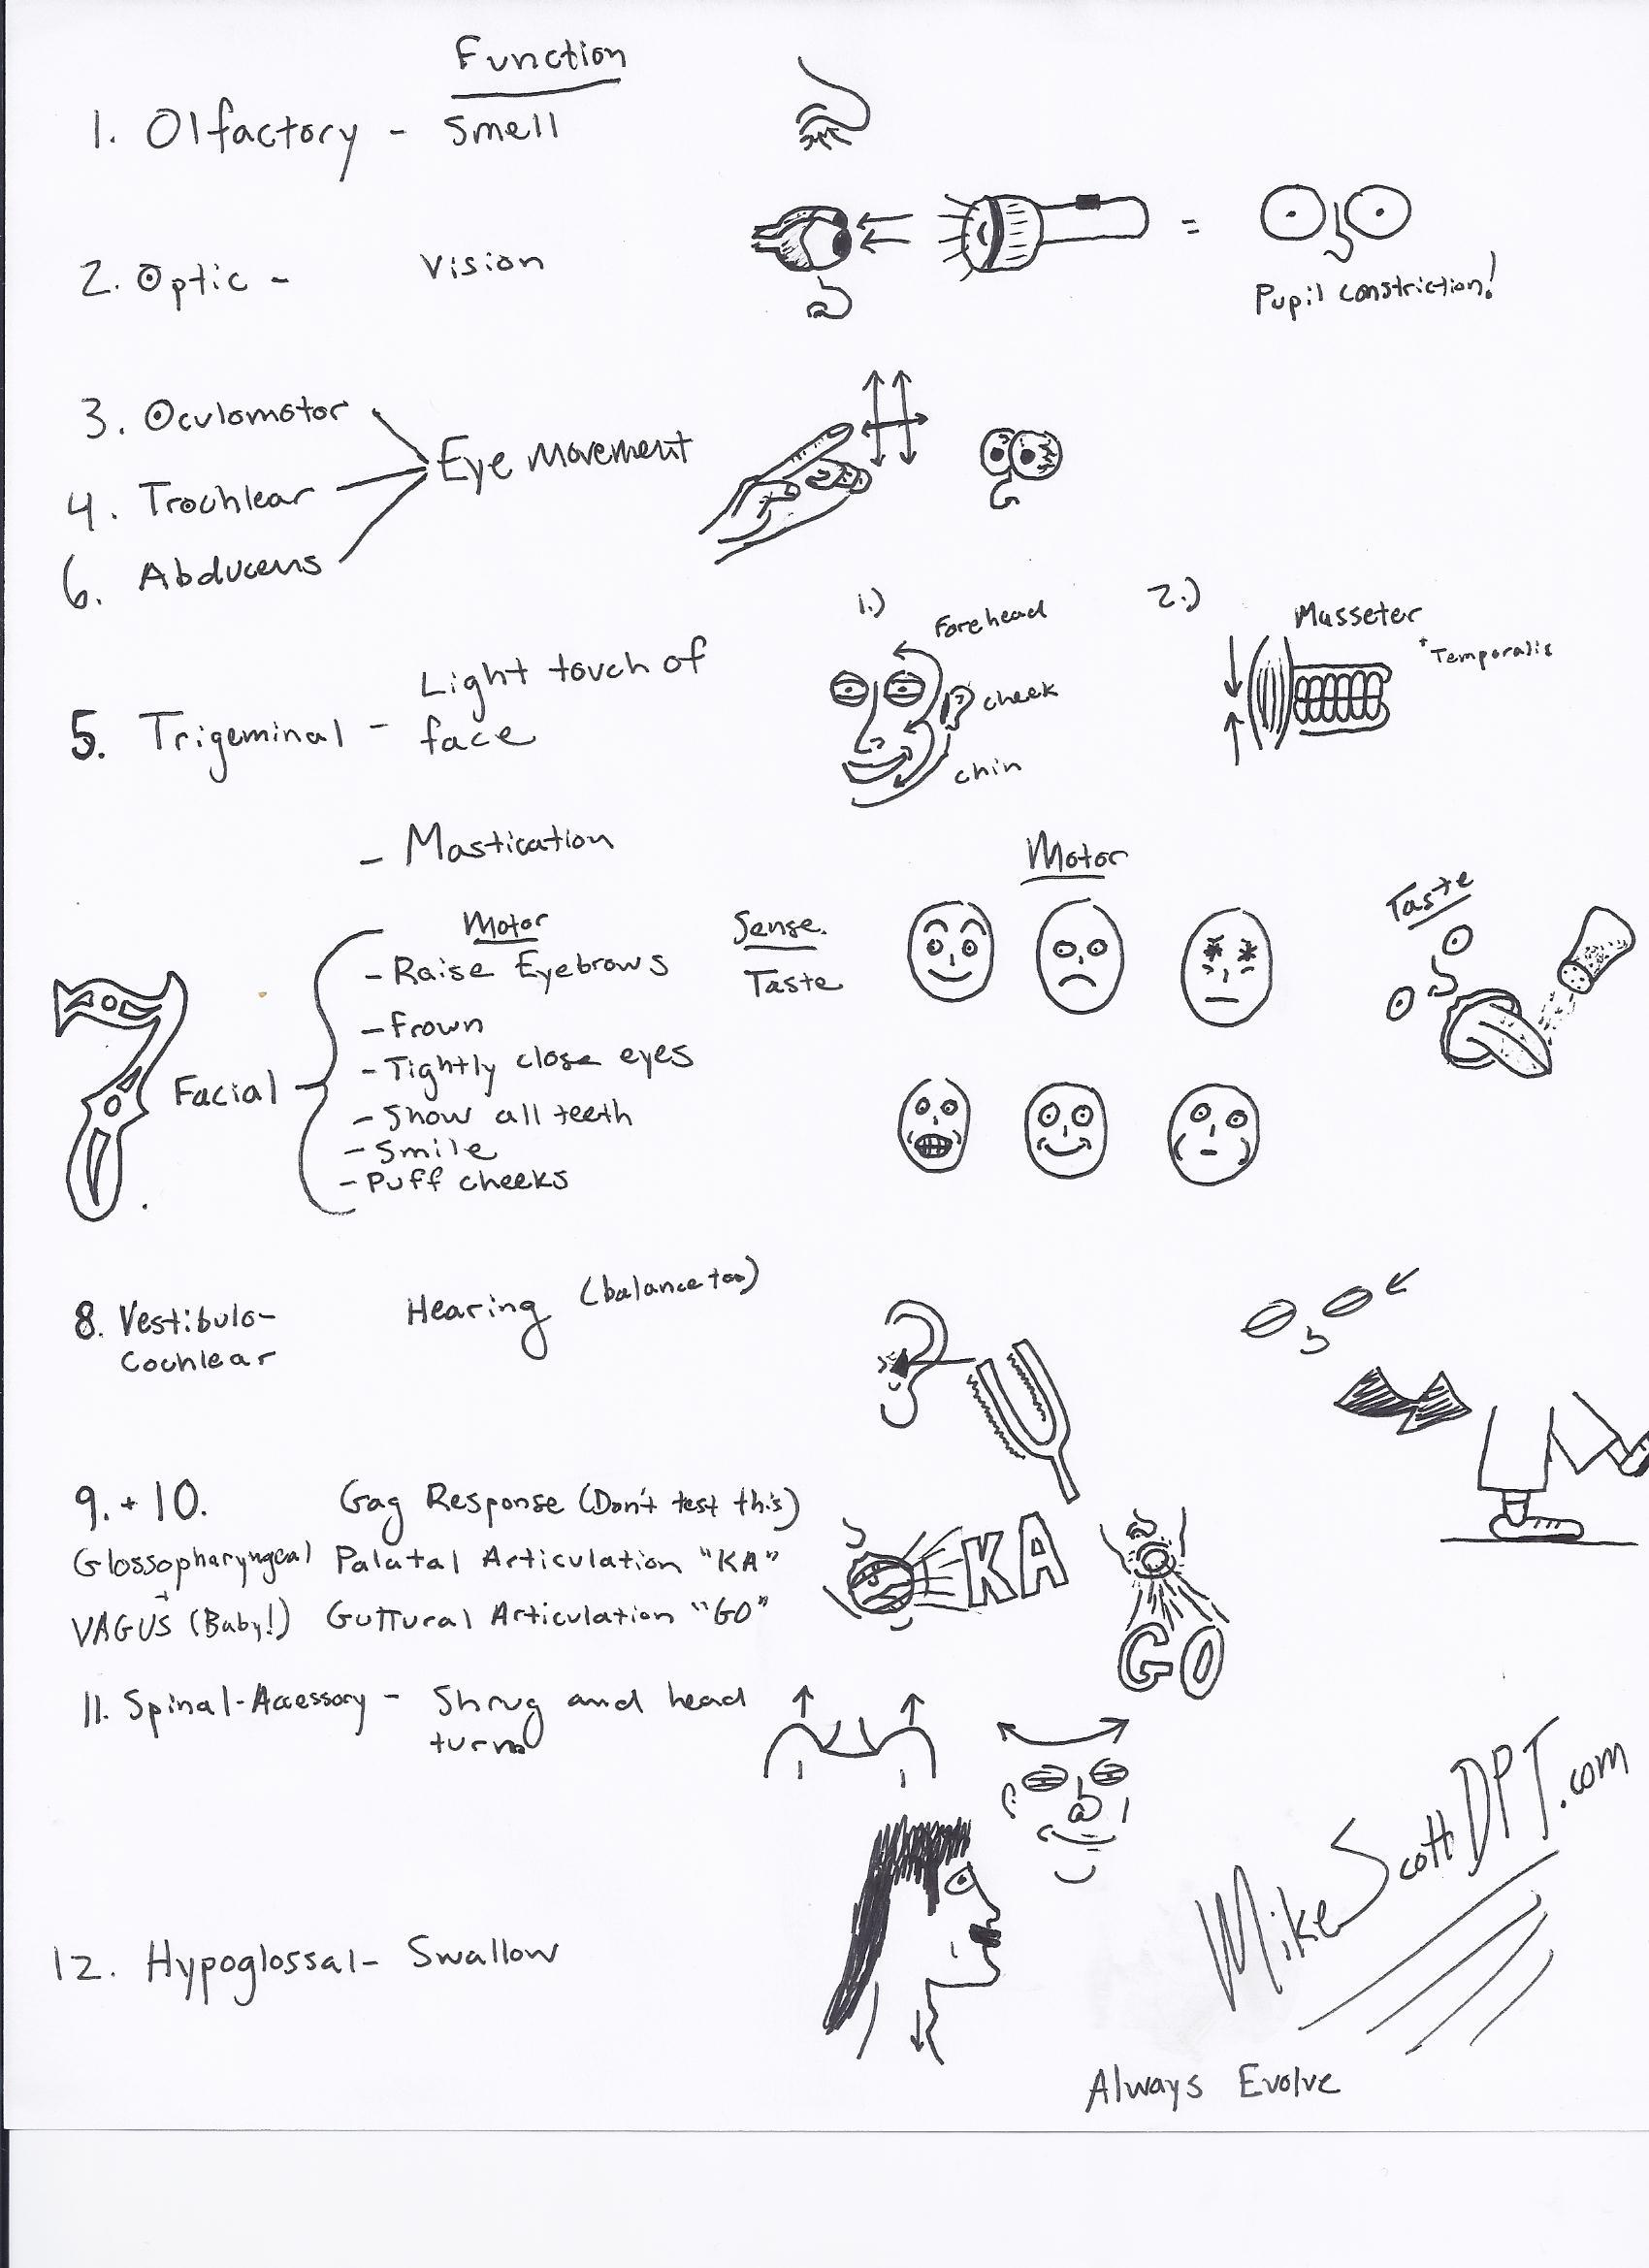 cranial nerve exam cheat sheet mike scott dpt. Black Bedroom Furniture Sets. Home Design Ideas